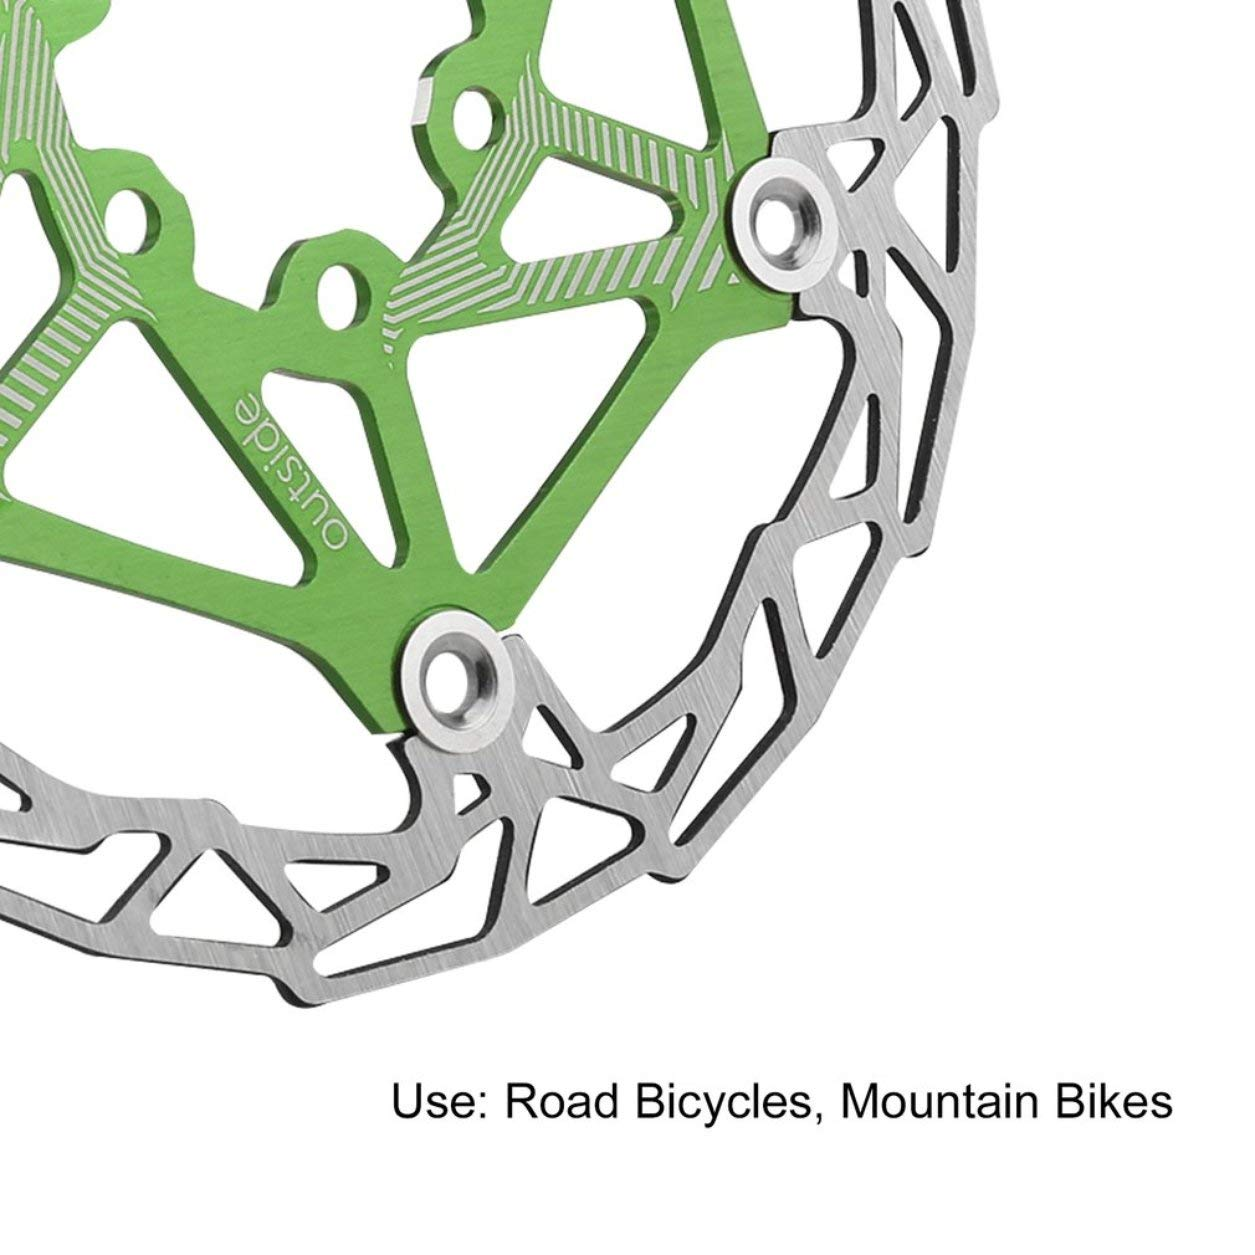 Colore: Blu Dailyinshop DECKAS Ultra-Light MTB Mountain Bike Bicicletta Disco Disco Galleggiante Galleggianti 160mm 6 Bolt Rotori Parti Accessori Ciclismo